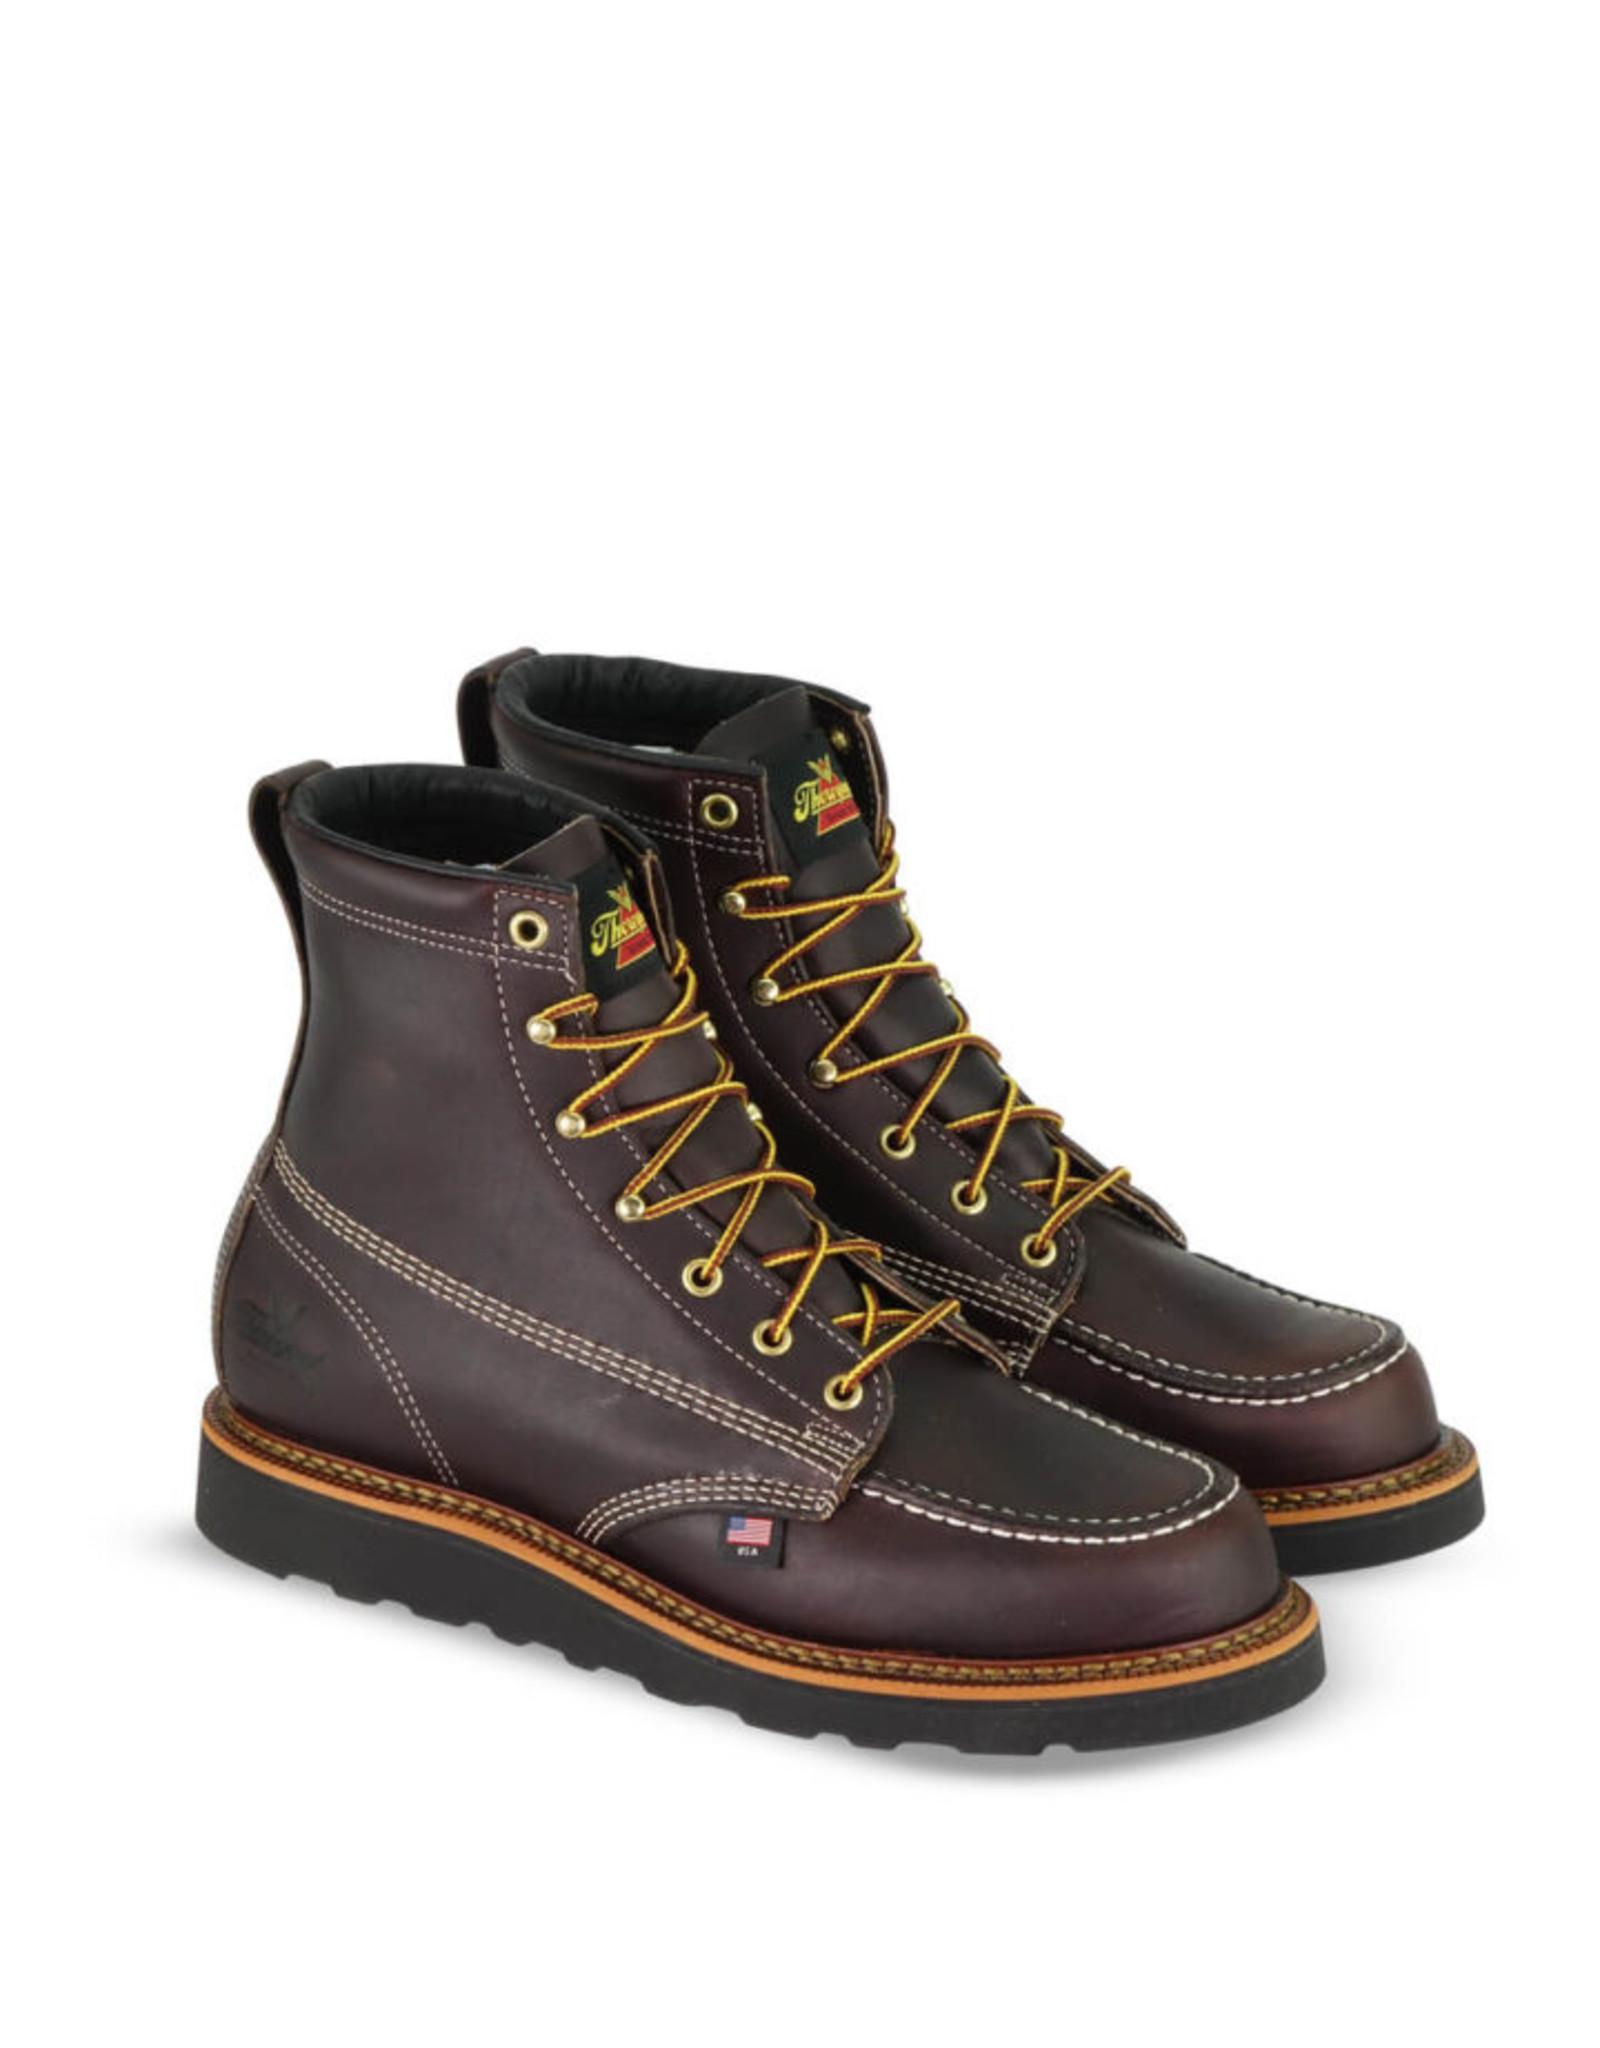 Boots-Men THOROGOOD 814-4266 American Heritage 6in Moc- Black Wedge